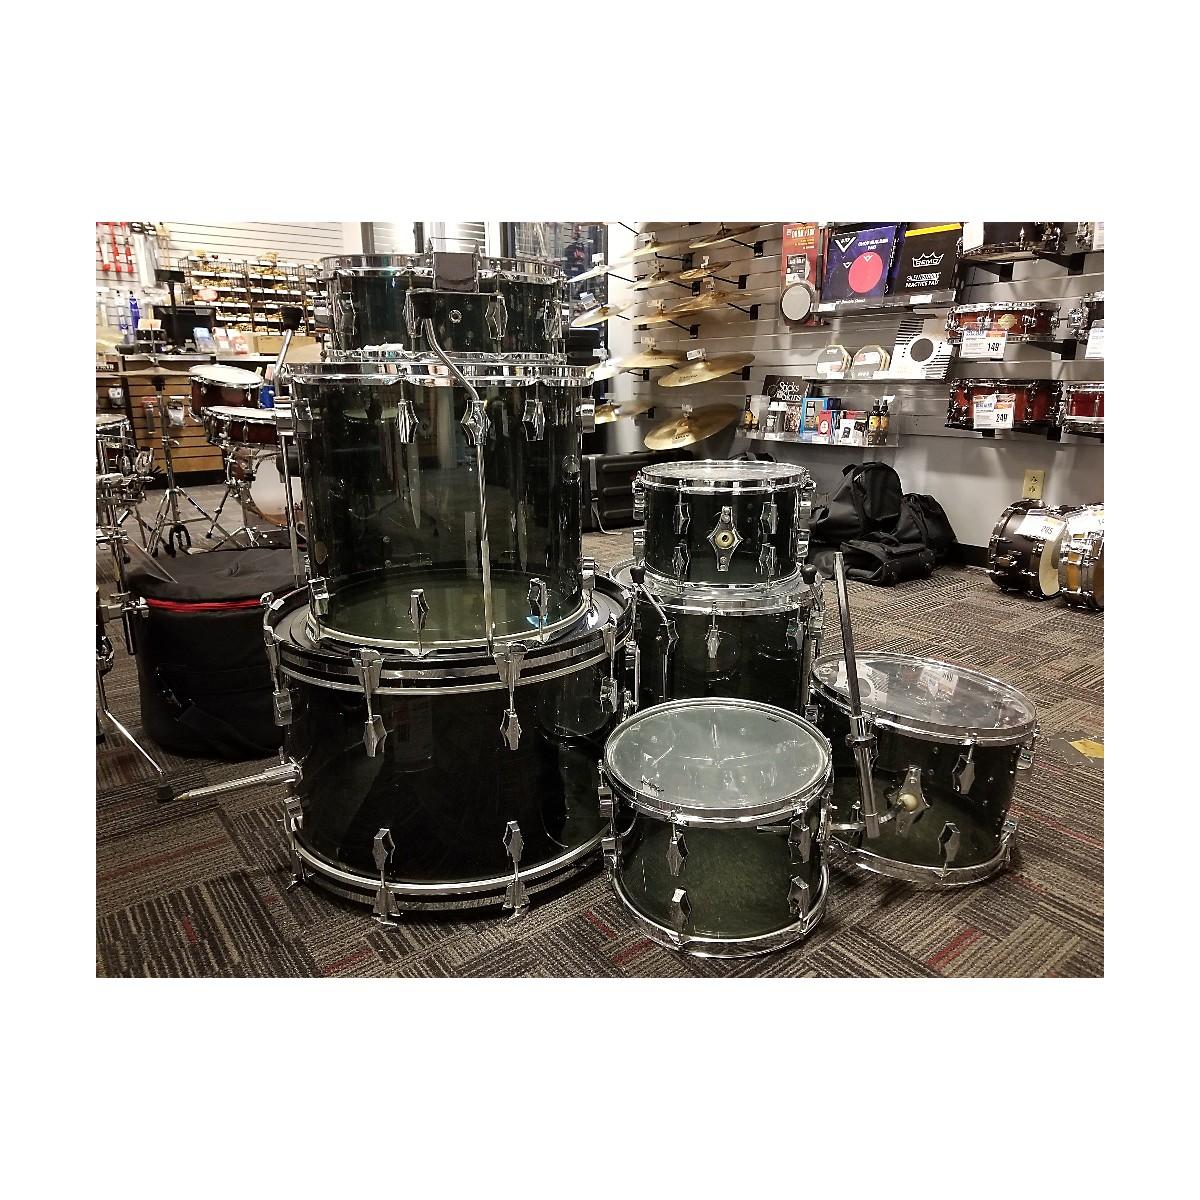 Fibes 1970s Acrylic Drum Kit